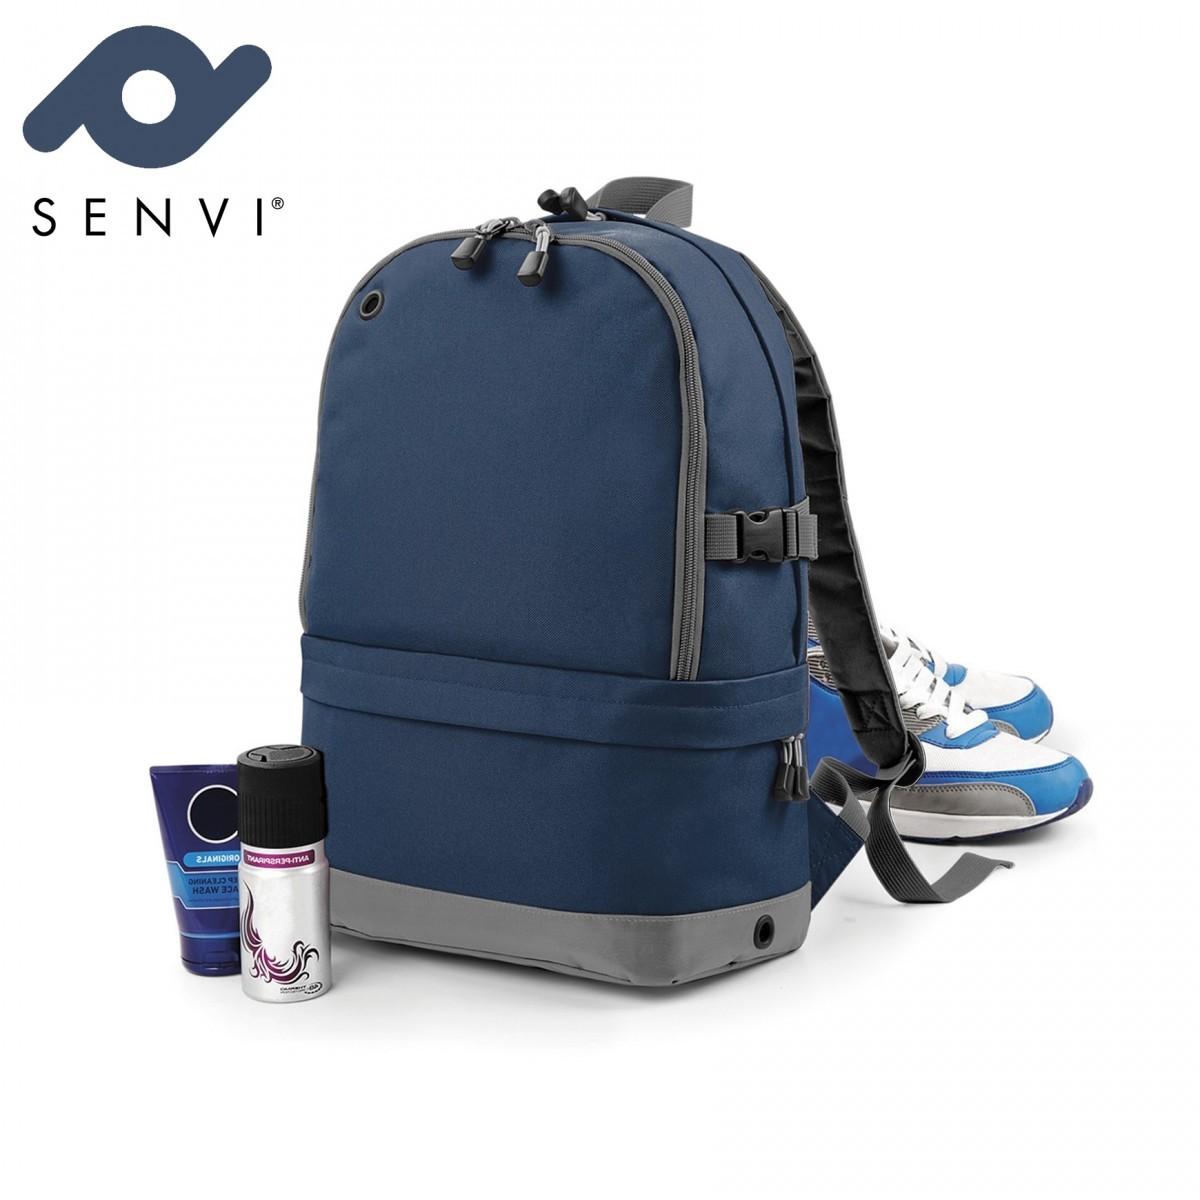 Senvi Sports Pro Rugzak kleur Blauw Grijs (waterafstotend)